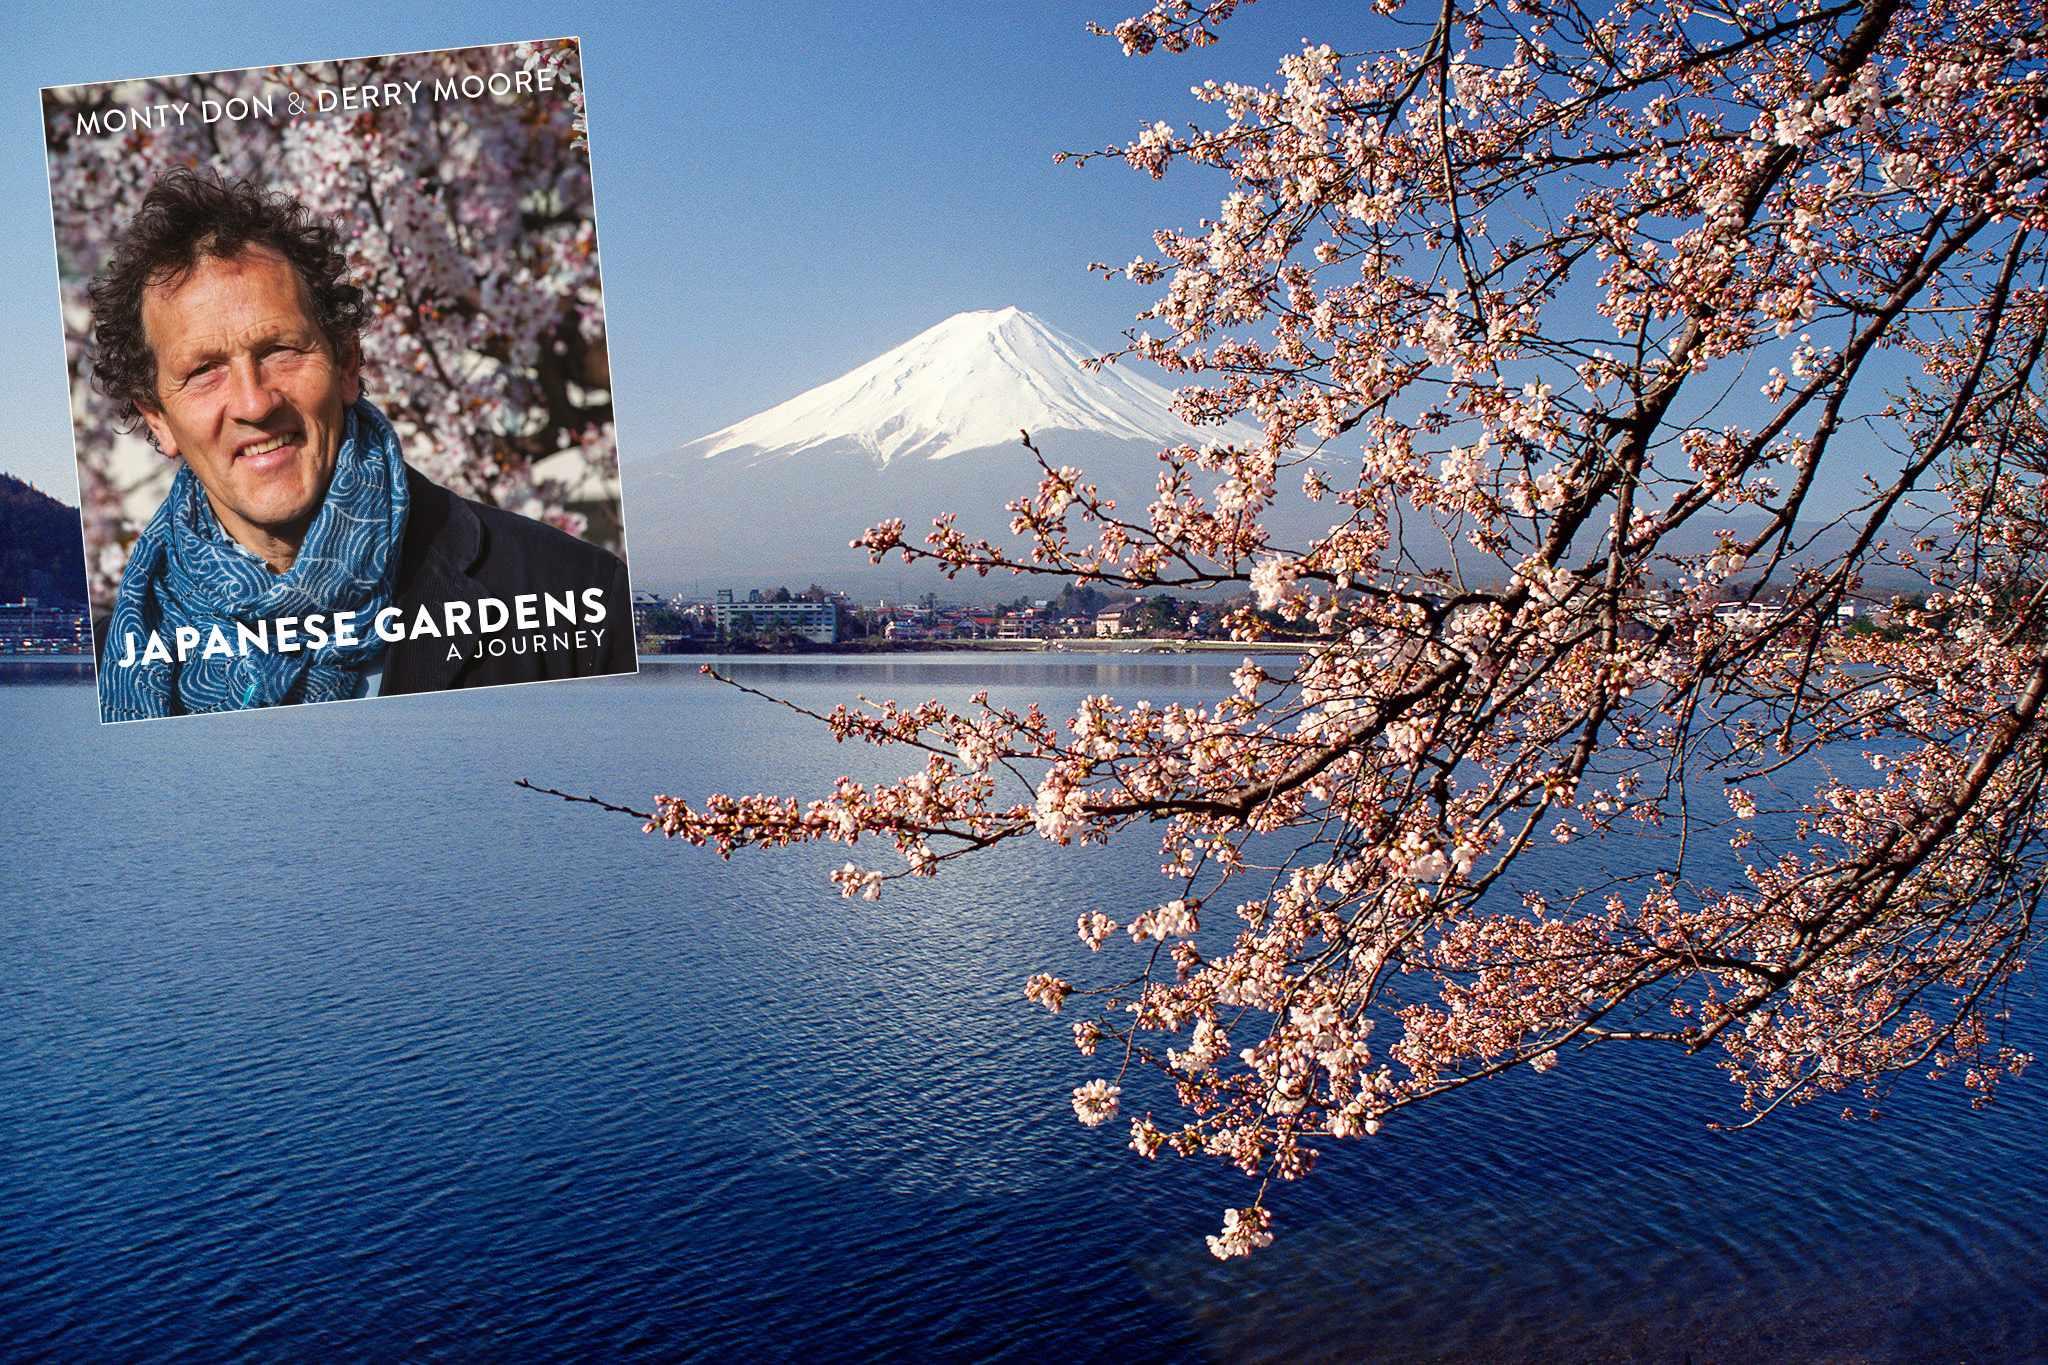 japan-garden-discover-mount-fuji-monty-book-2048-1365